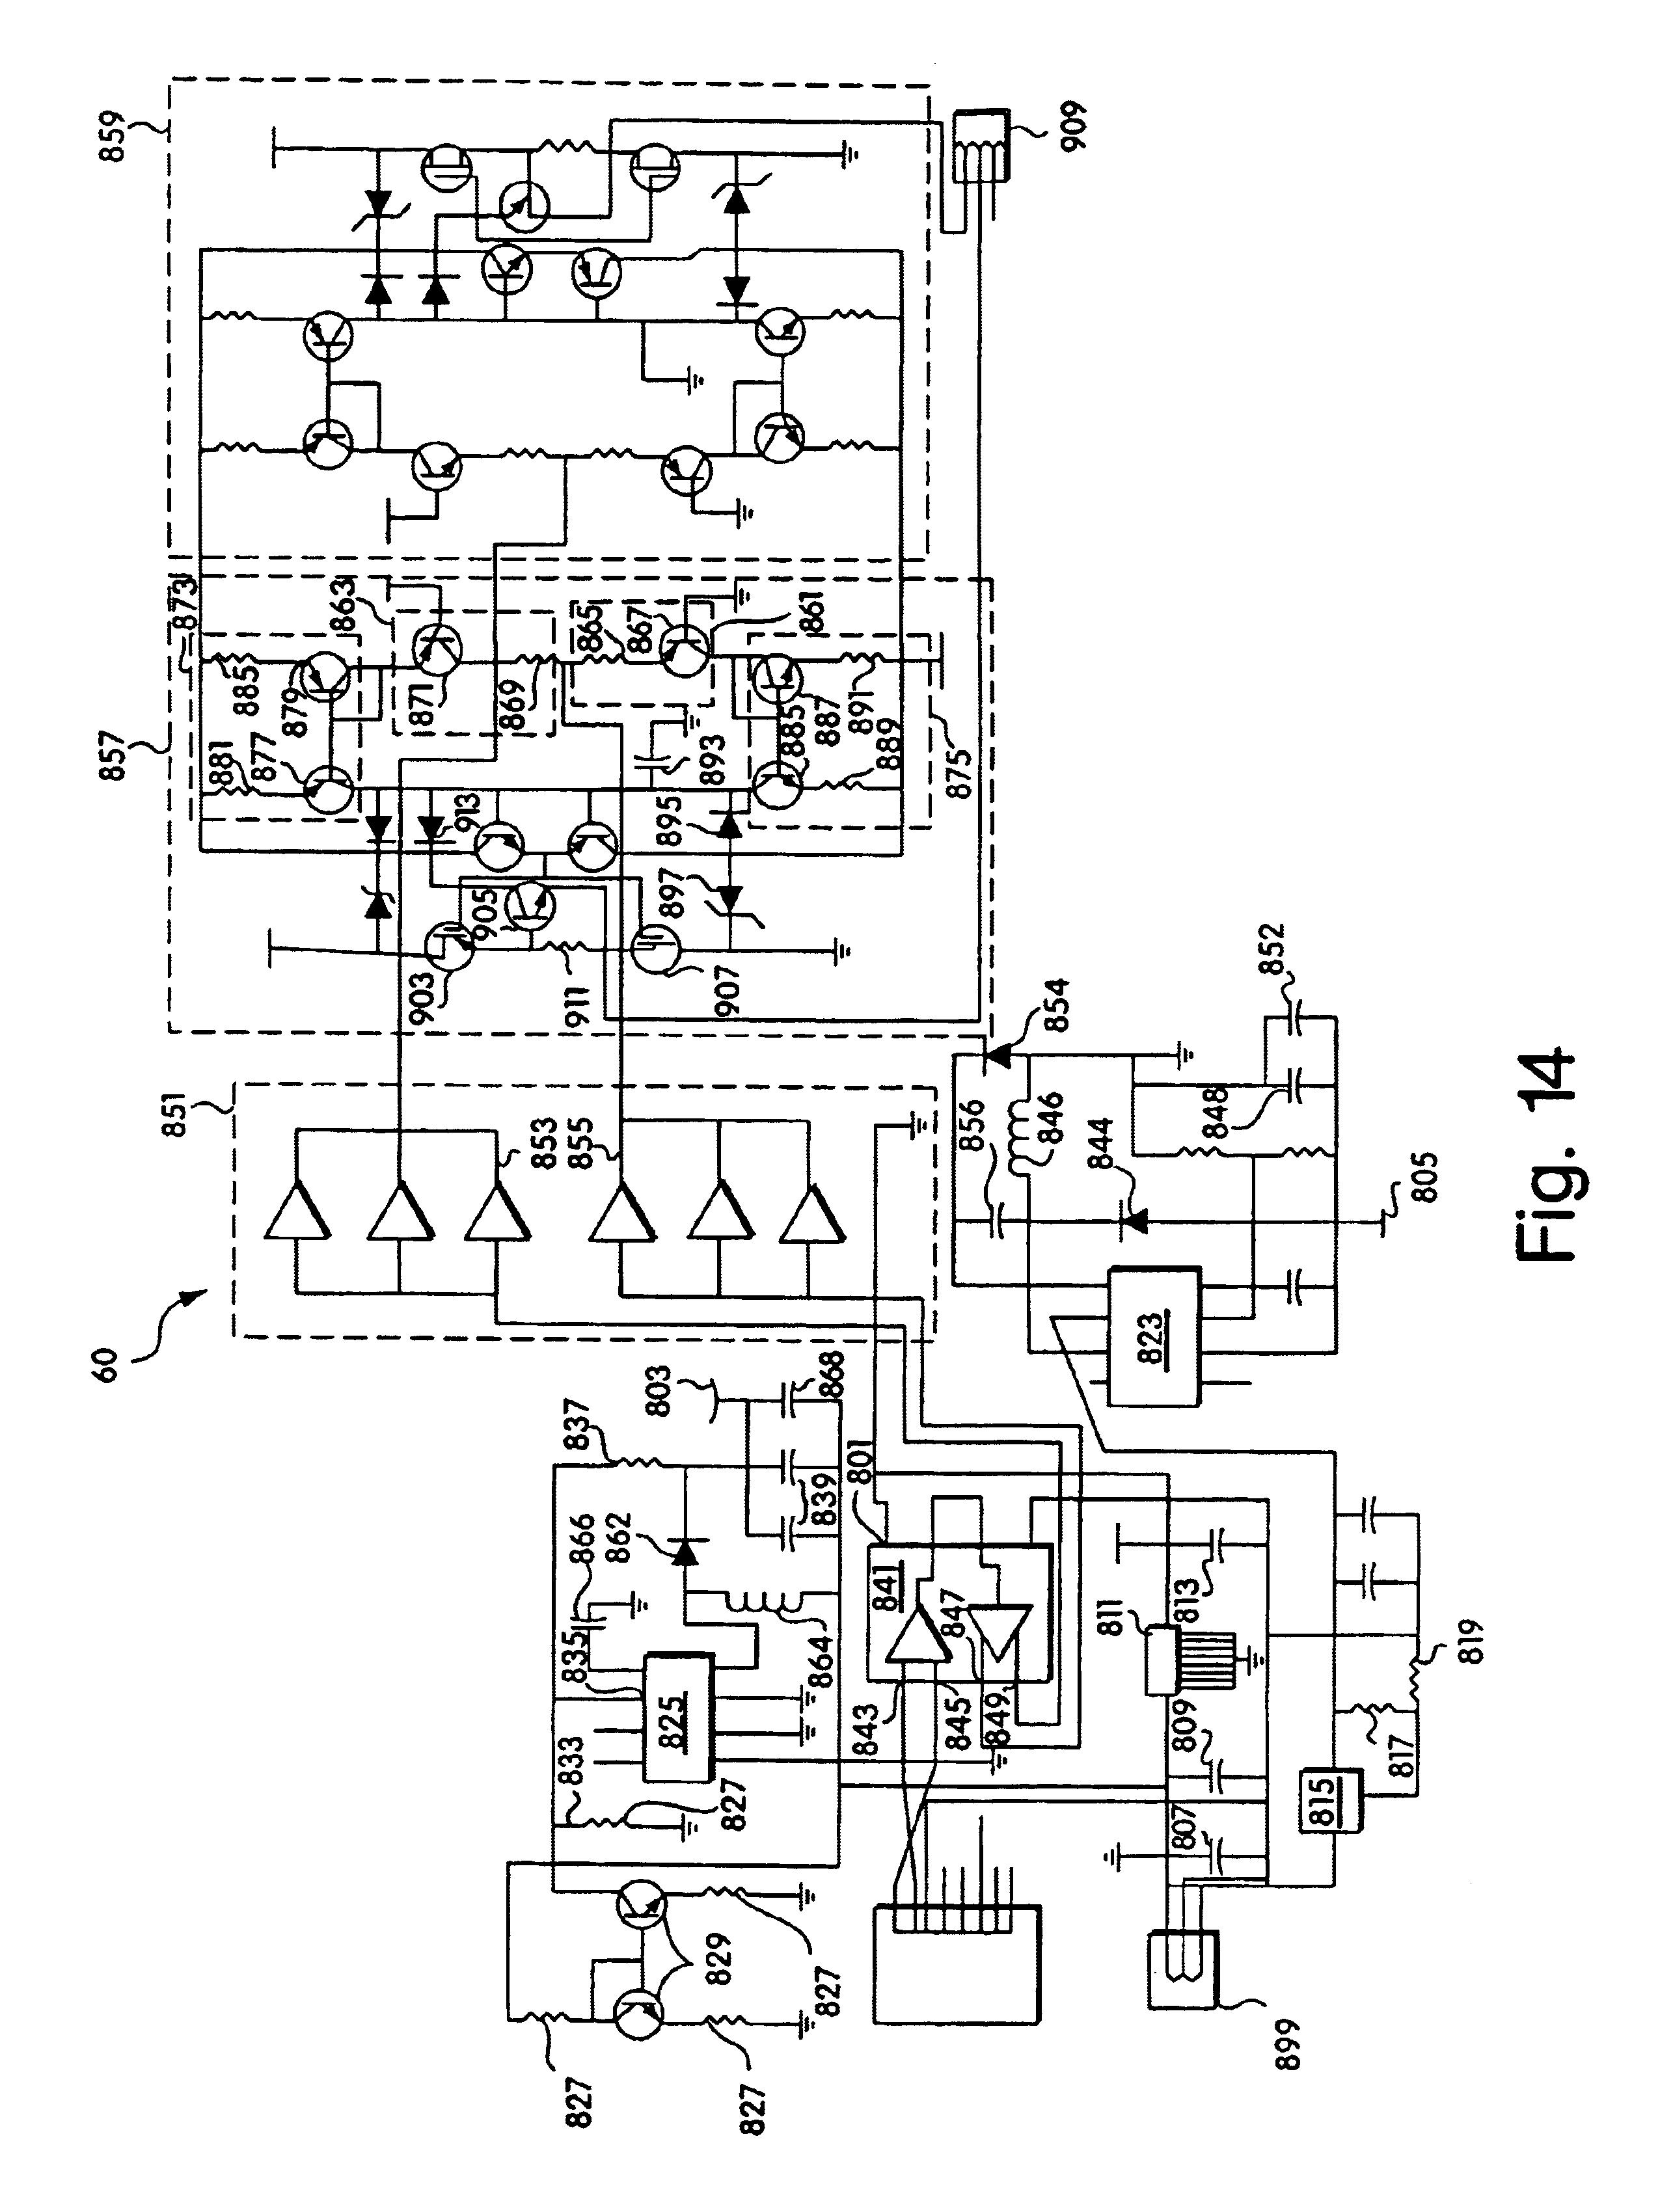 Magnatek 6300 Wiring Diagram Page 3 And Schematics Magnetek Electric Motor 3240 Century Ac